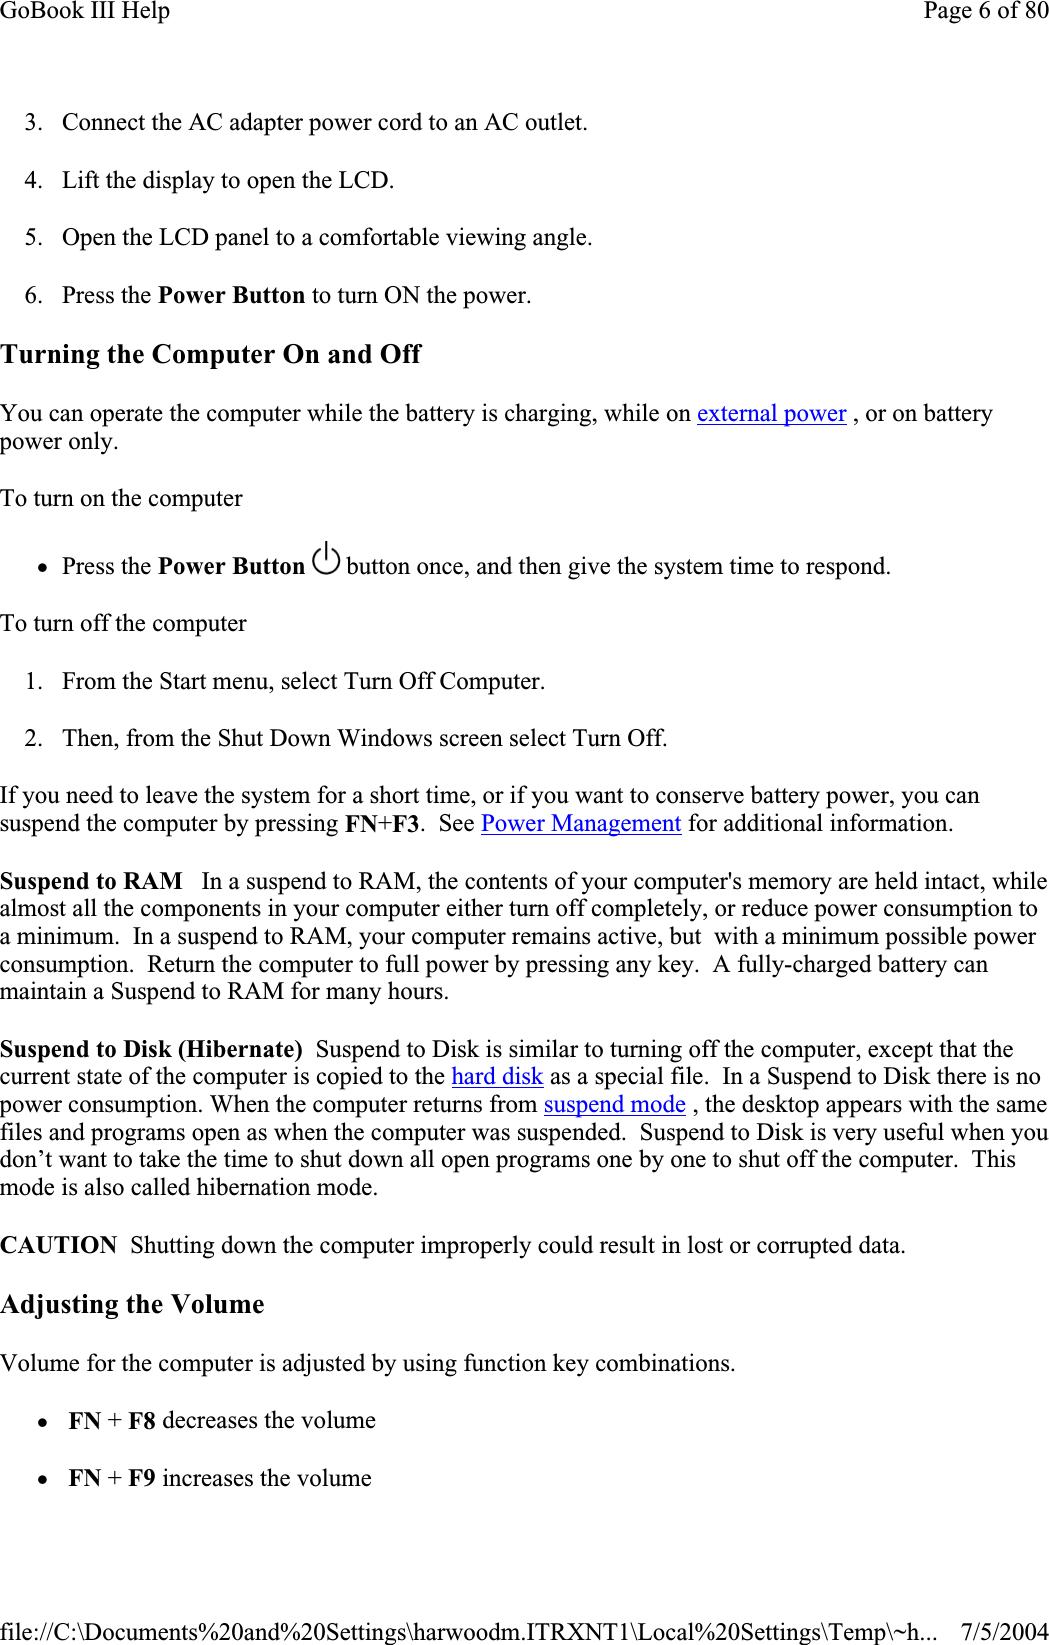 General Dynamics Itronix IX260PNL3AC580 Laptop PC with Dual-Band PCS